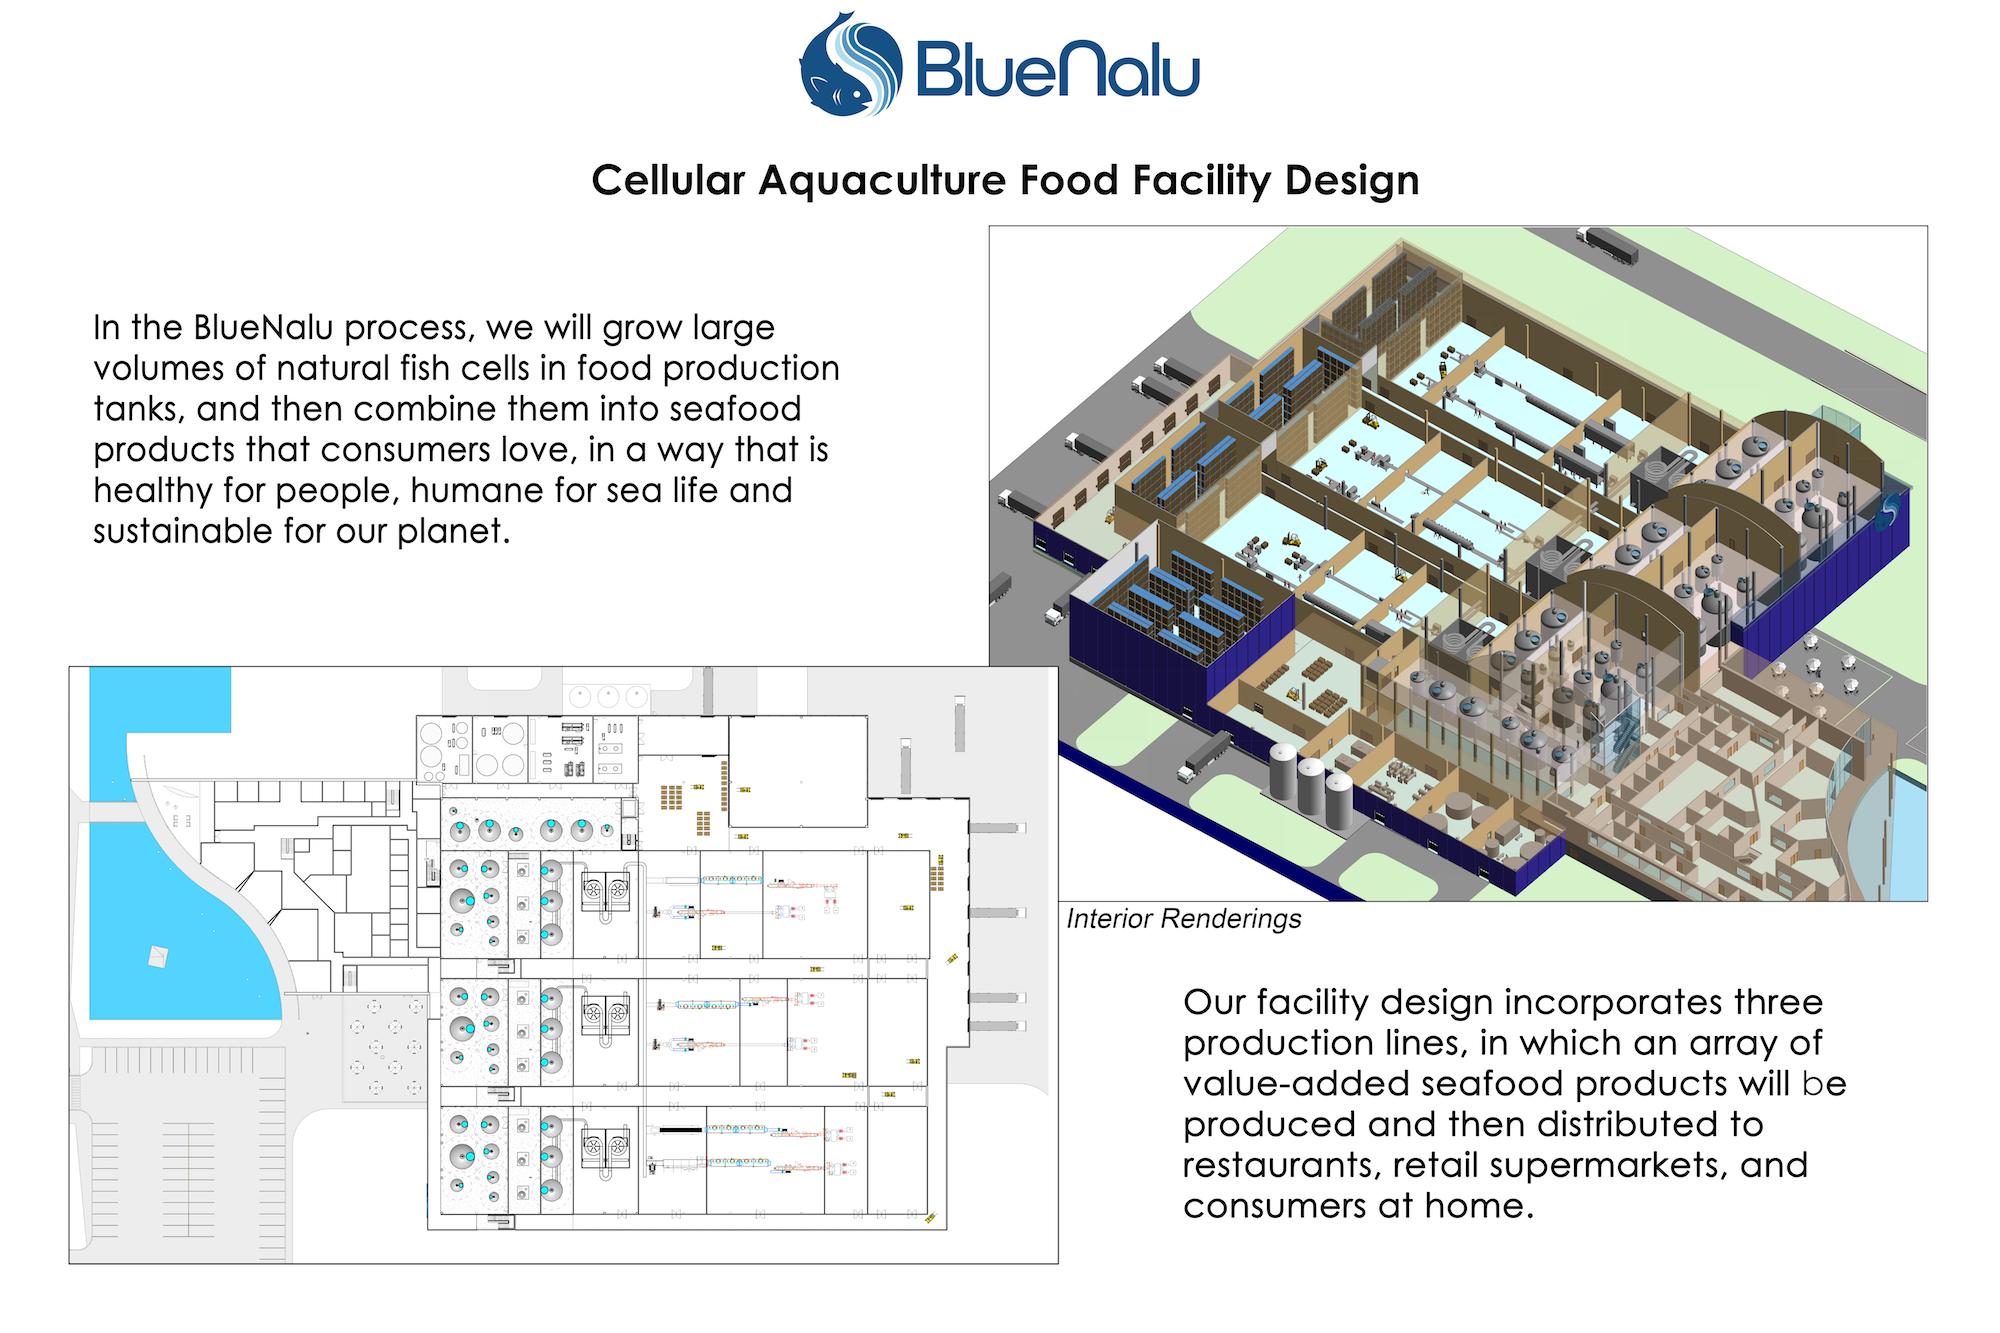 BlueNalu_Food_Facility_Design_August_2019.jpg